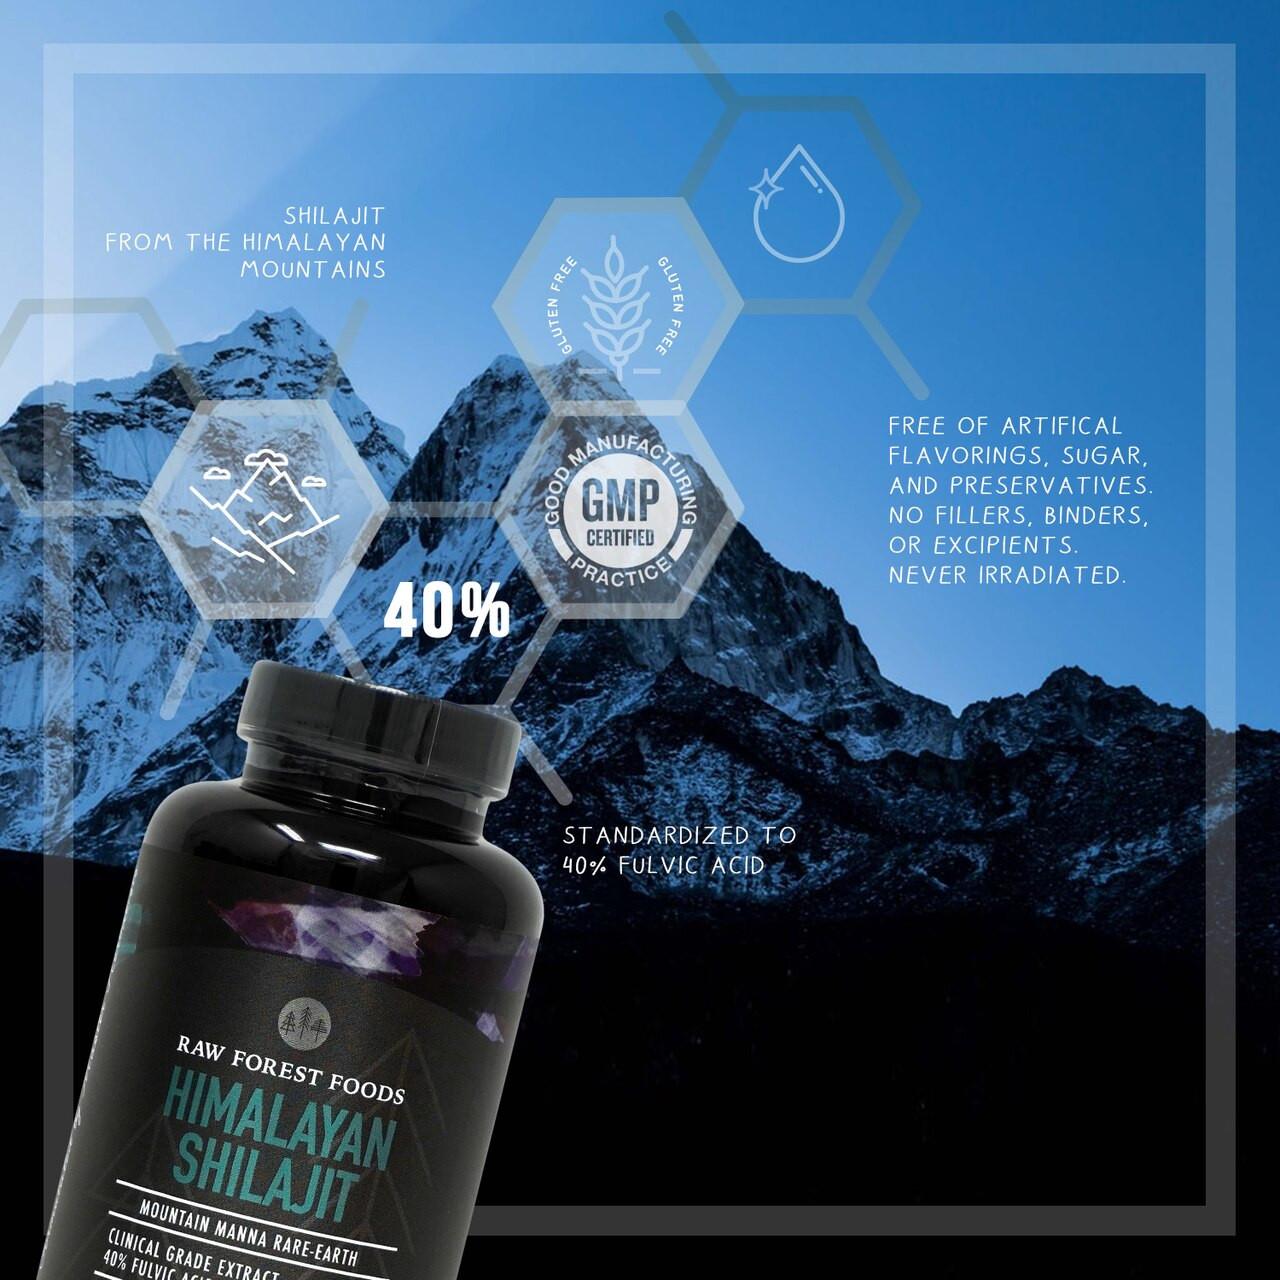 RAW Forest Foods Shilajit Extract Capsules — Mountain Mana Rare-Earth — 40percent Fulvic Acid